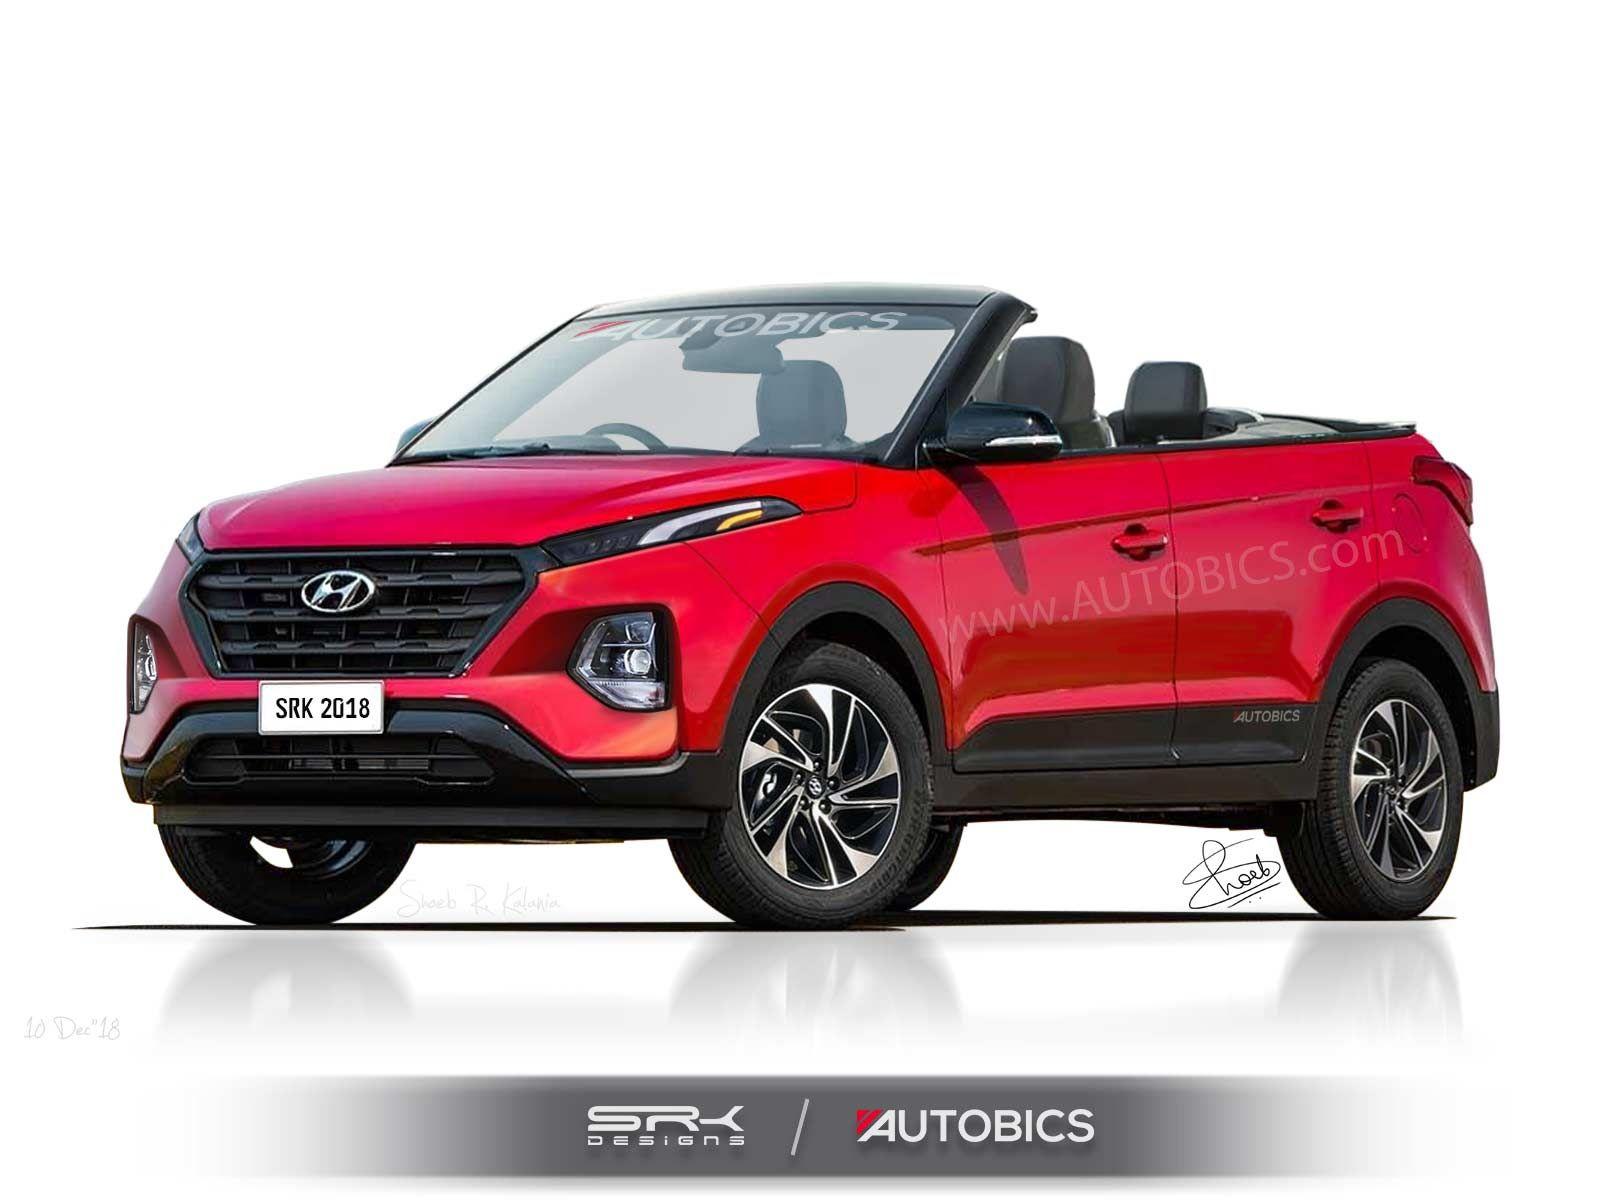 Hyundai Creta 2020 Facelift India Launch In Hindi Car O Tech Hyundai Car Mid Size Suv